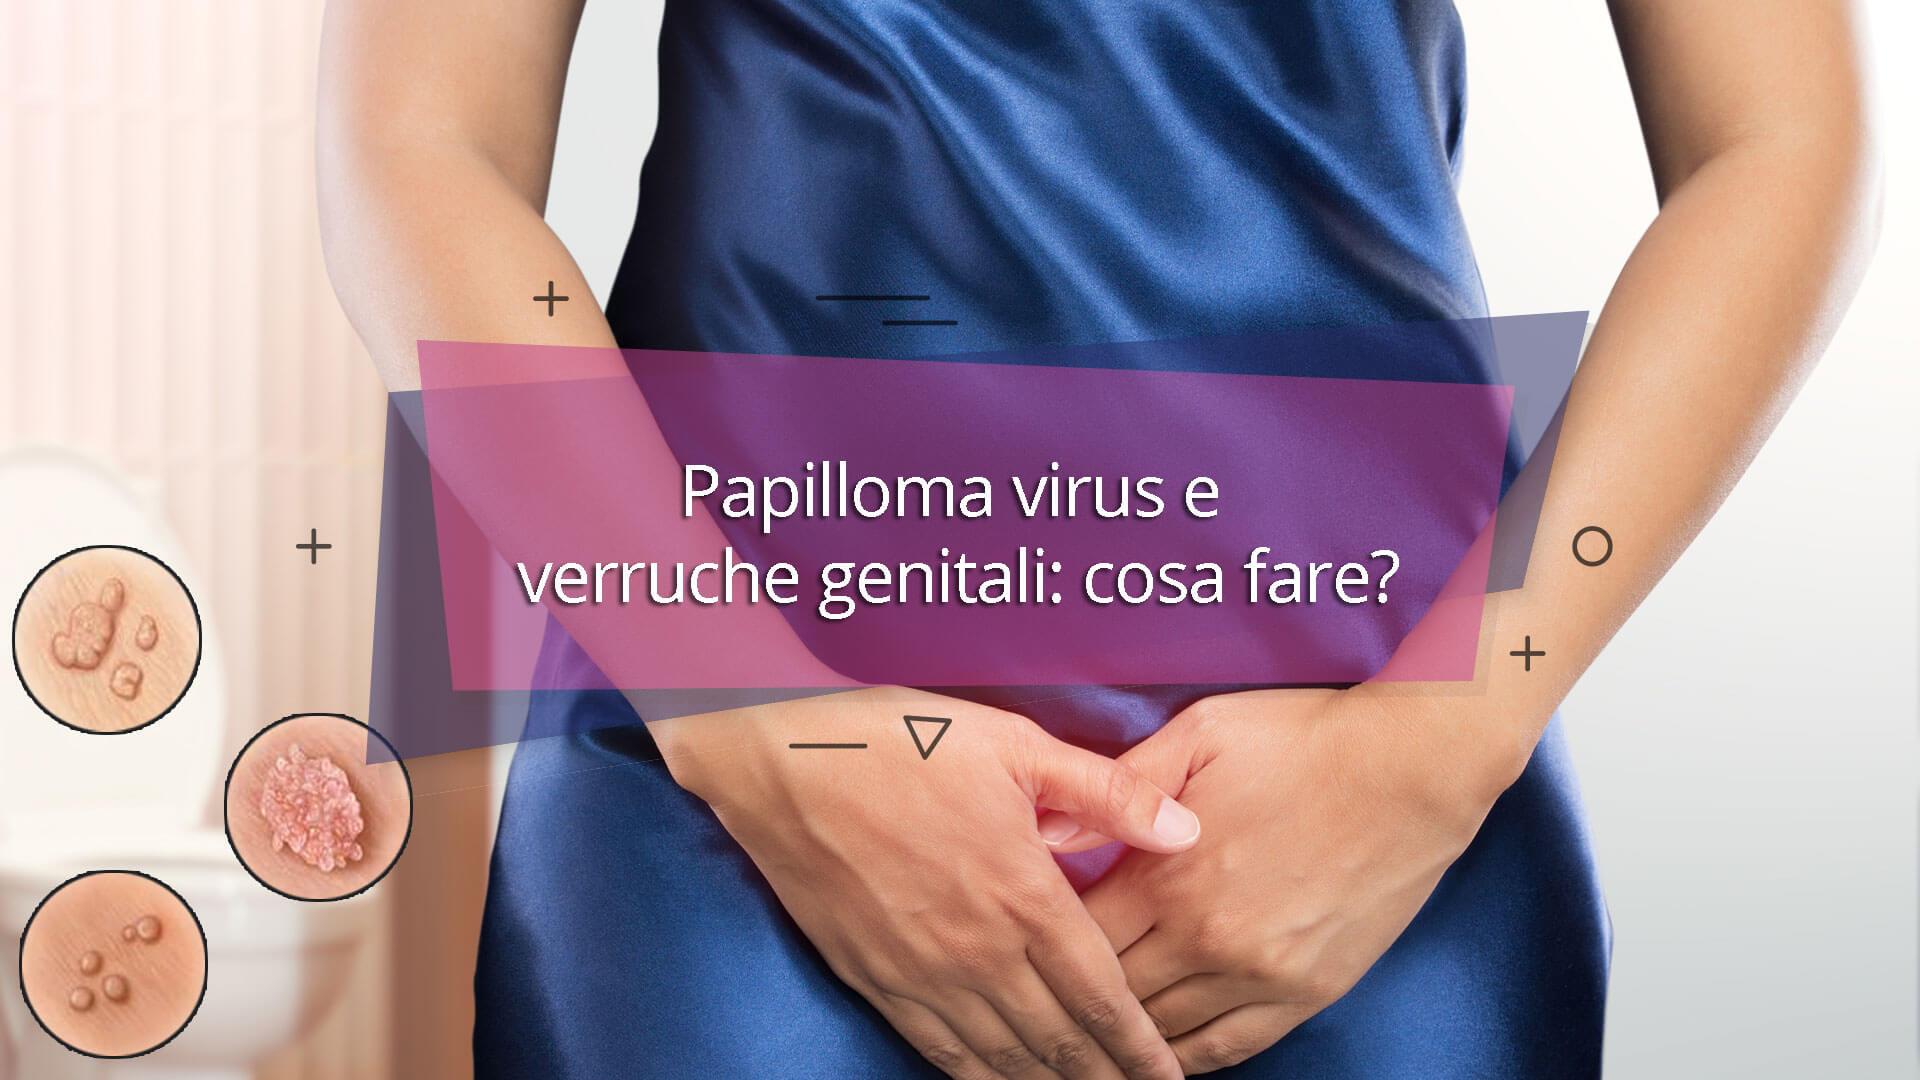 vaccino hpv verruche